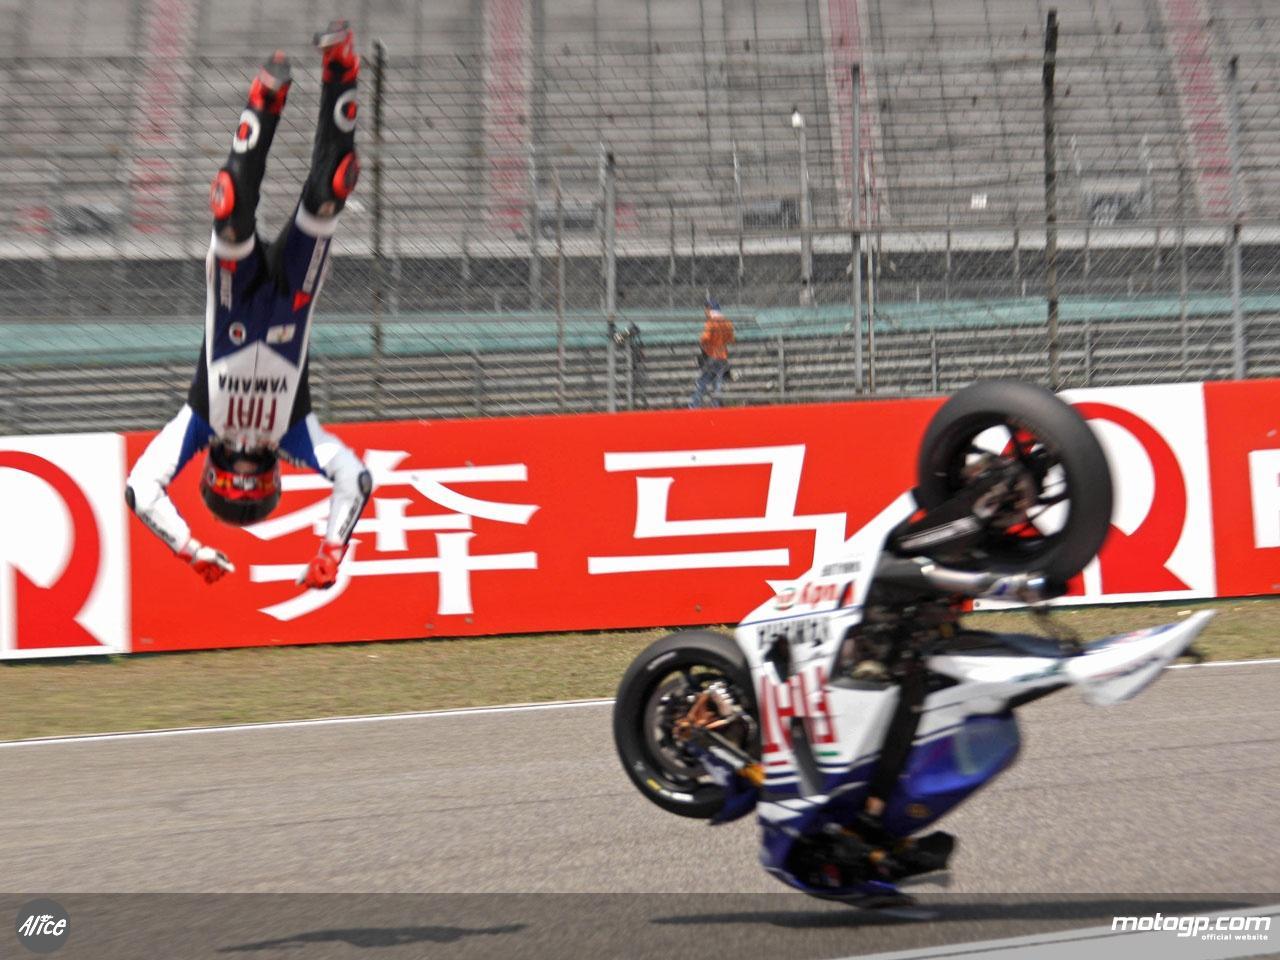 Motorsports - Performance Motorcycles: Moto GP Crash